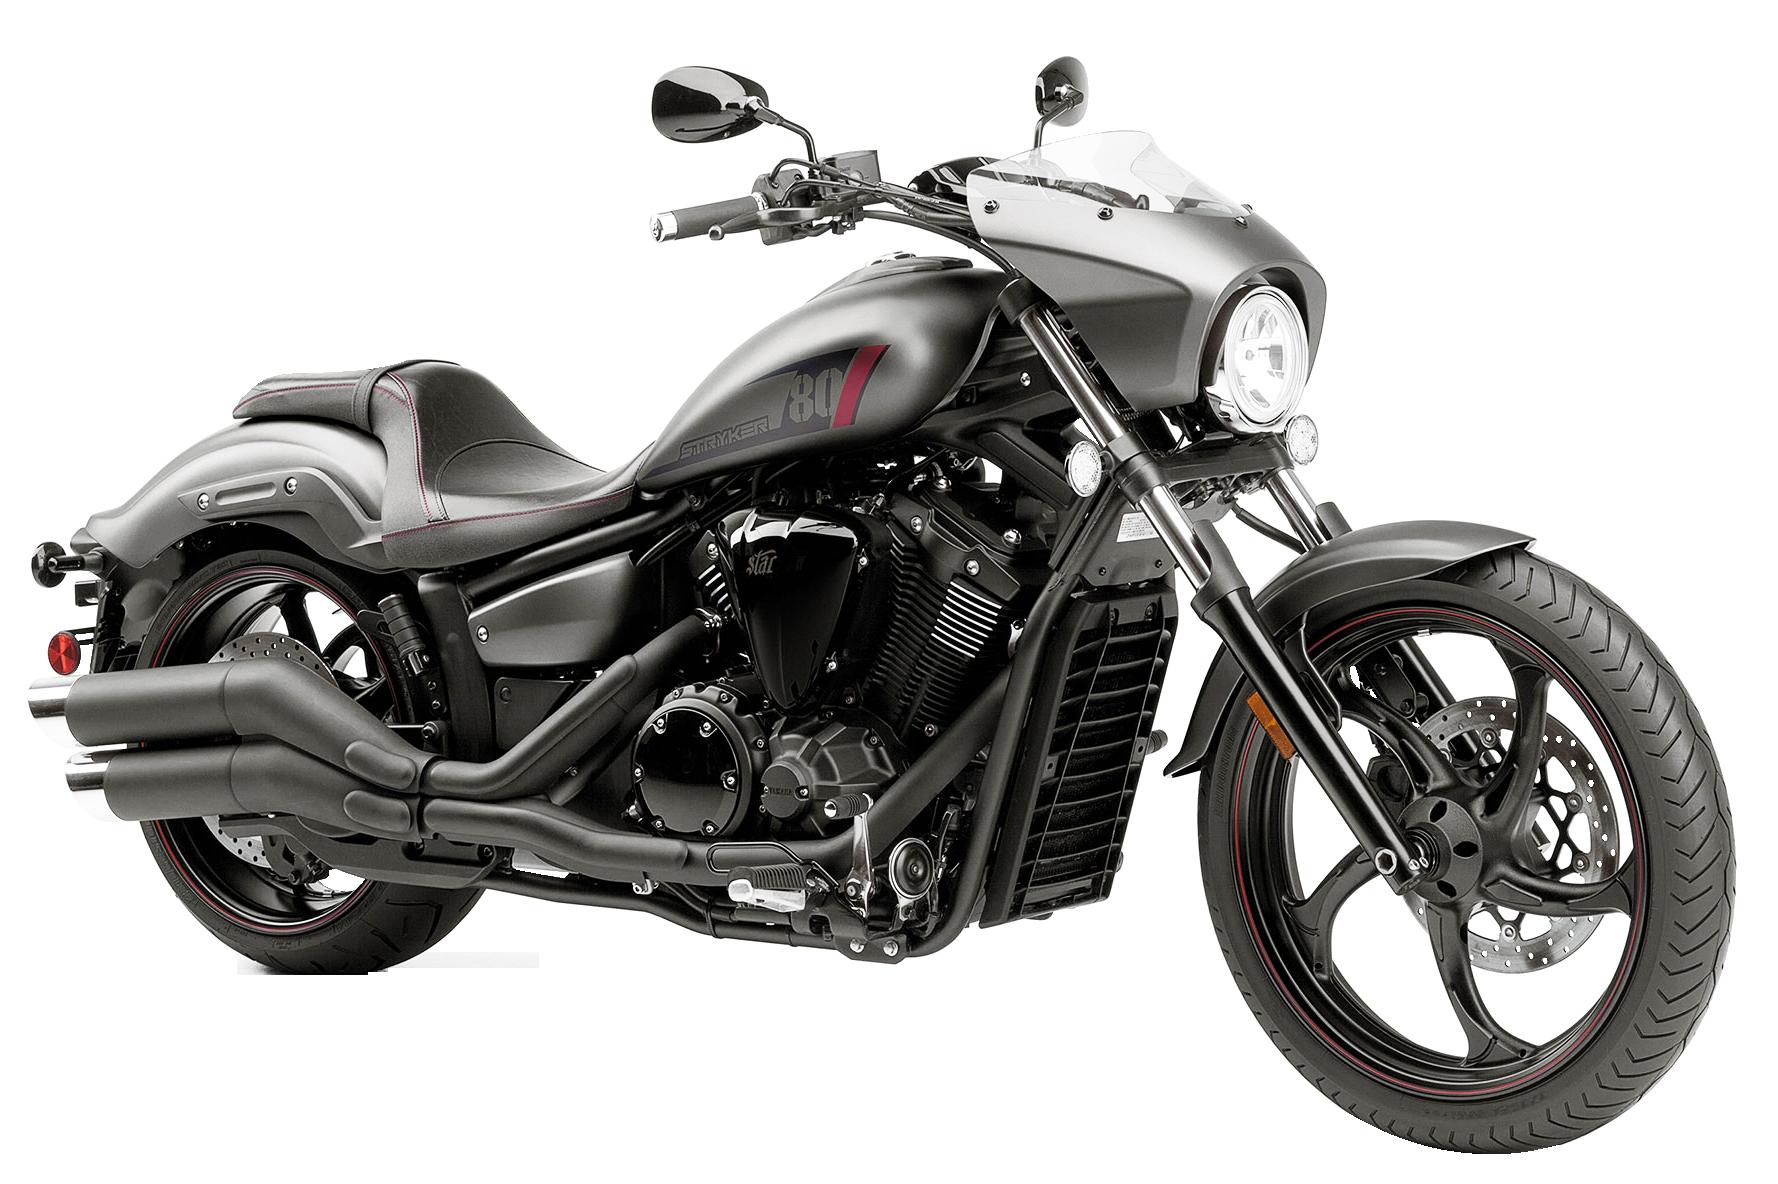 Motorcycle clipart cruiser motorcycle. Yamaha stryker bullet cowl